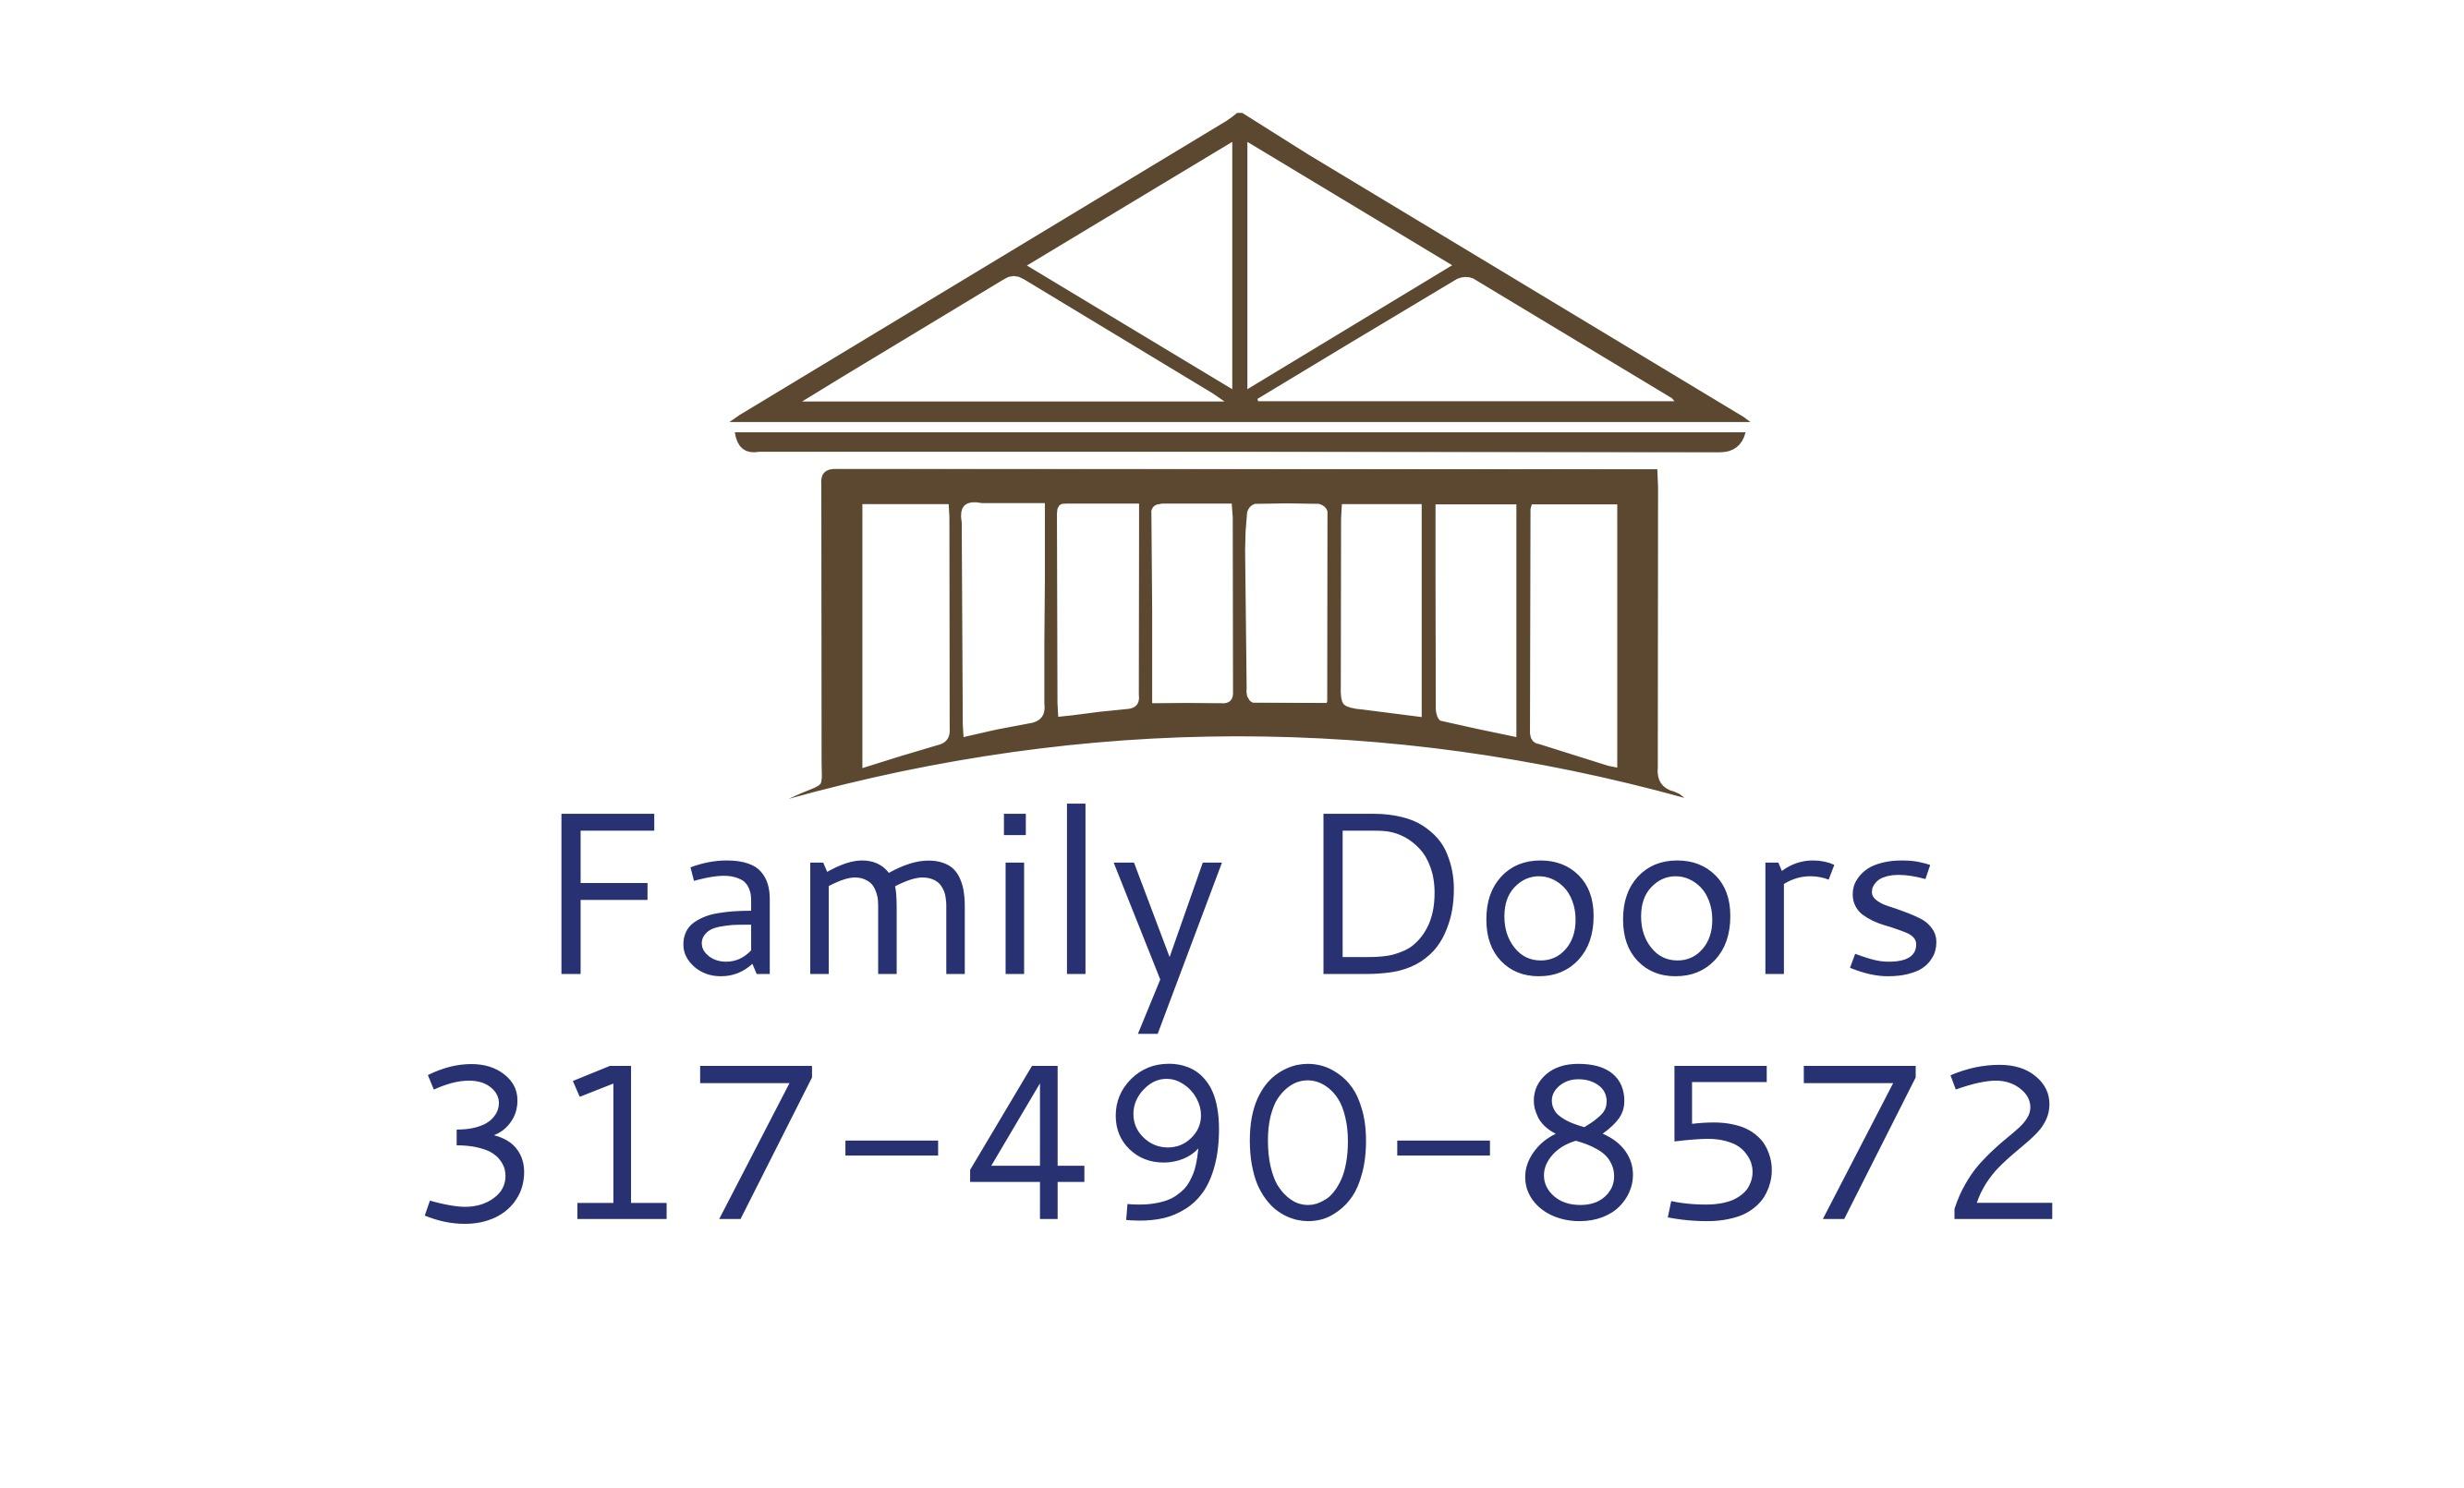 Family Doors LLC logo